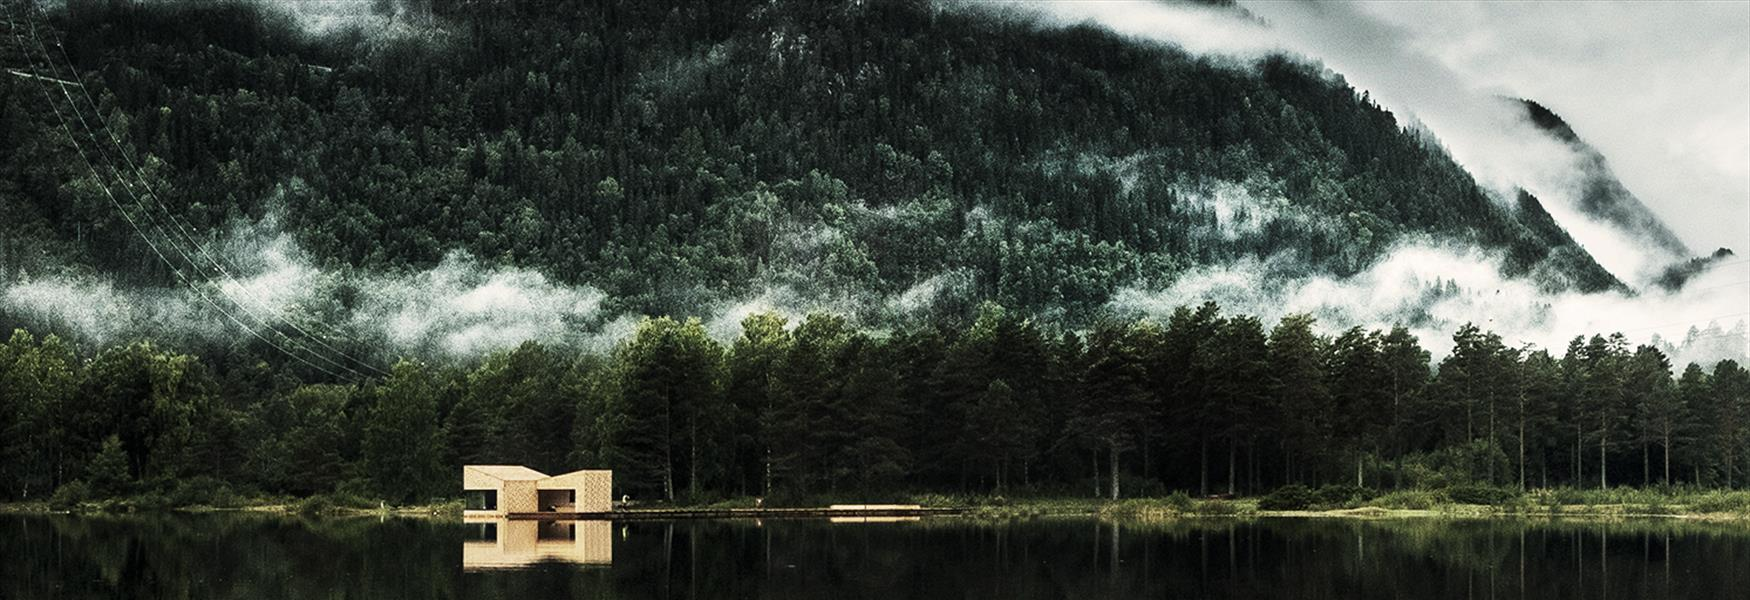 Soria Moria badstue ved Telemarkskanalen i Dalen